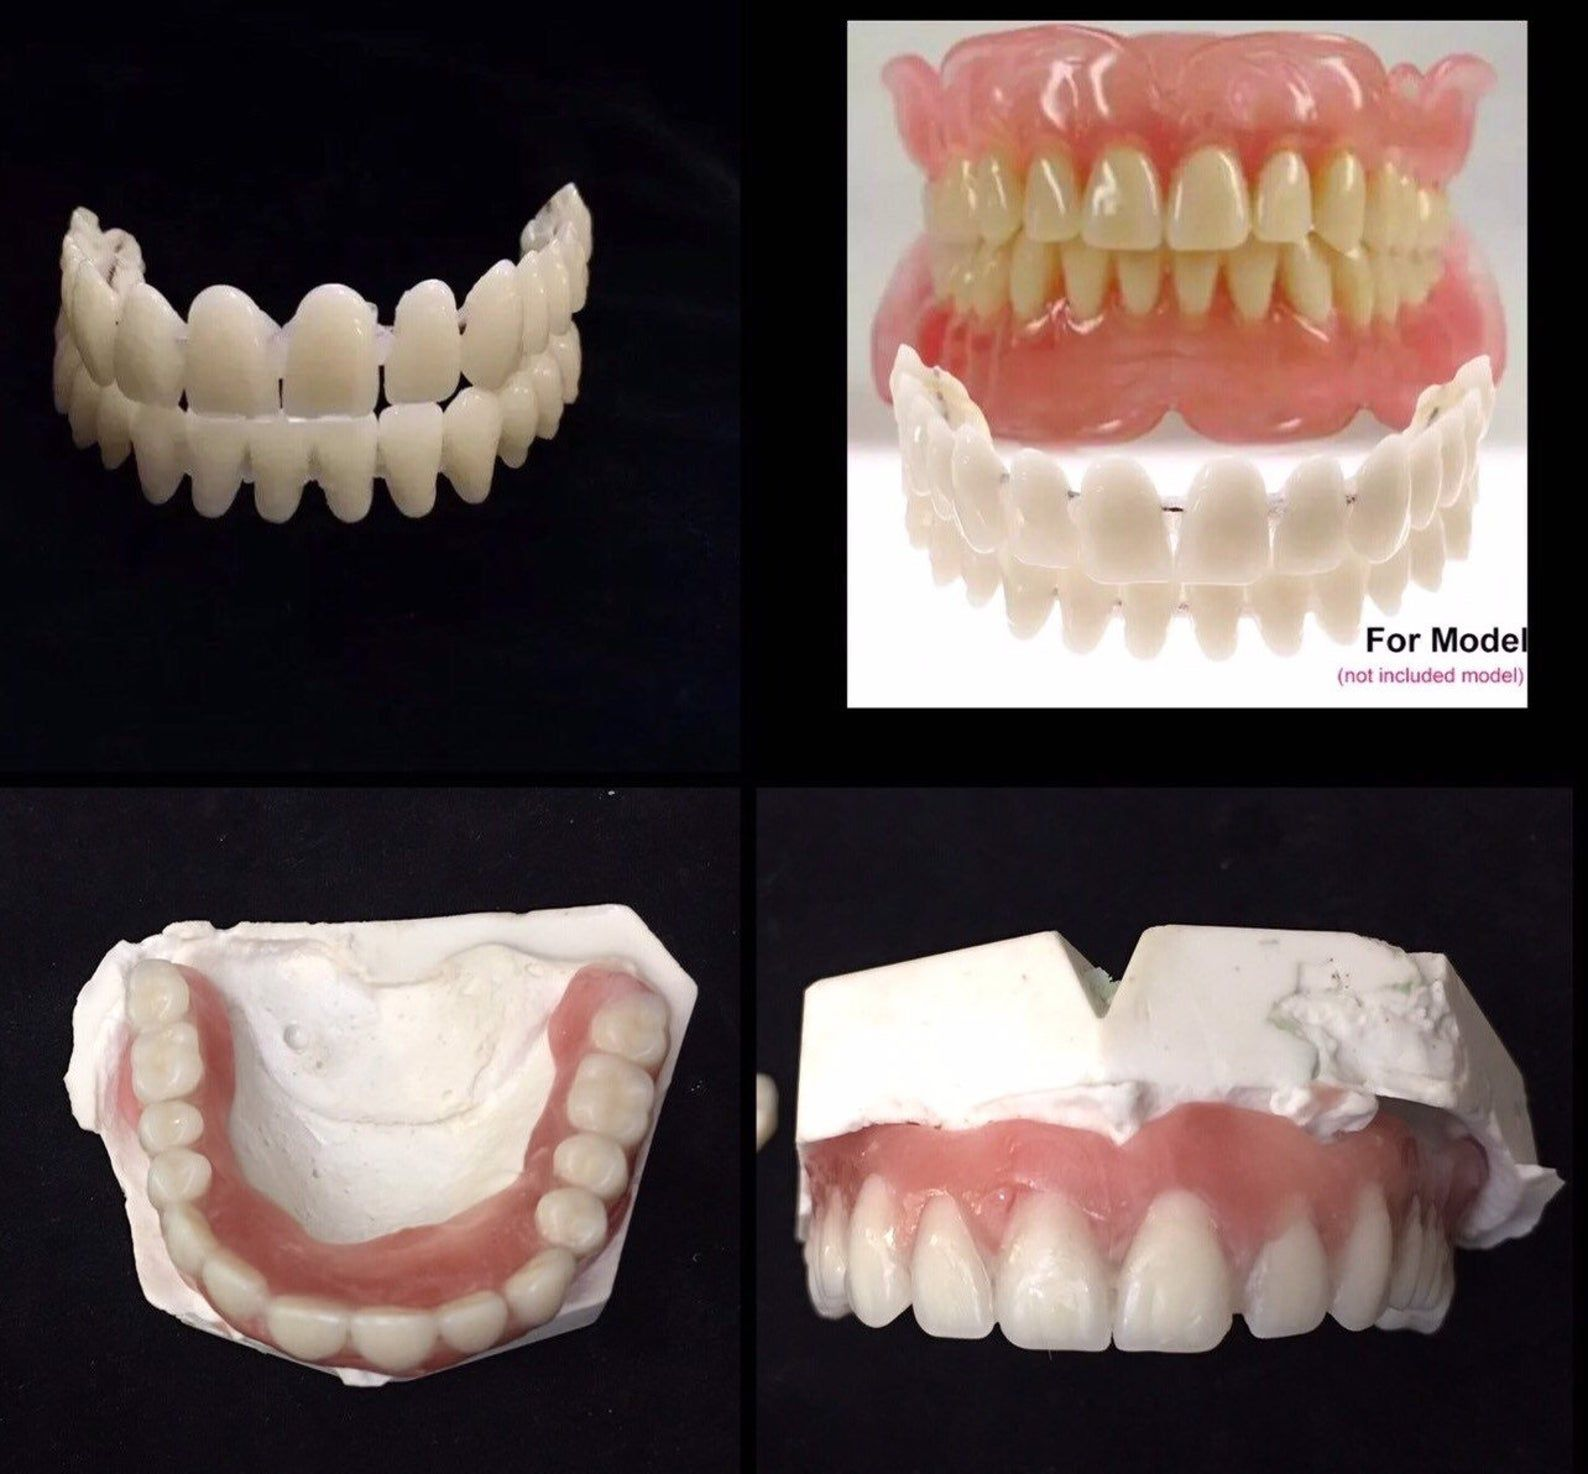 Do It Yourself Denture Teeth DIY Denture Kit False Teeth